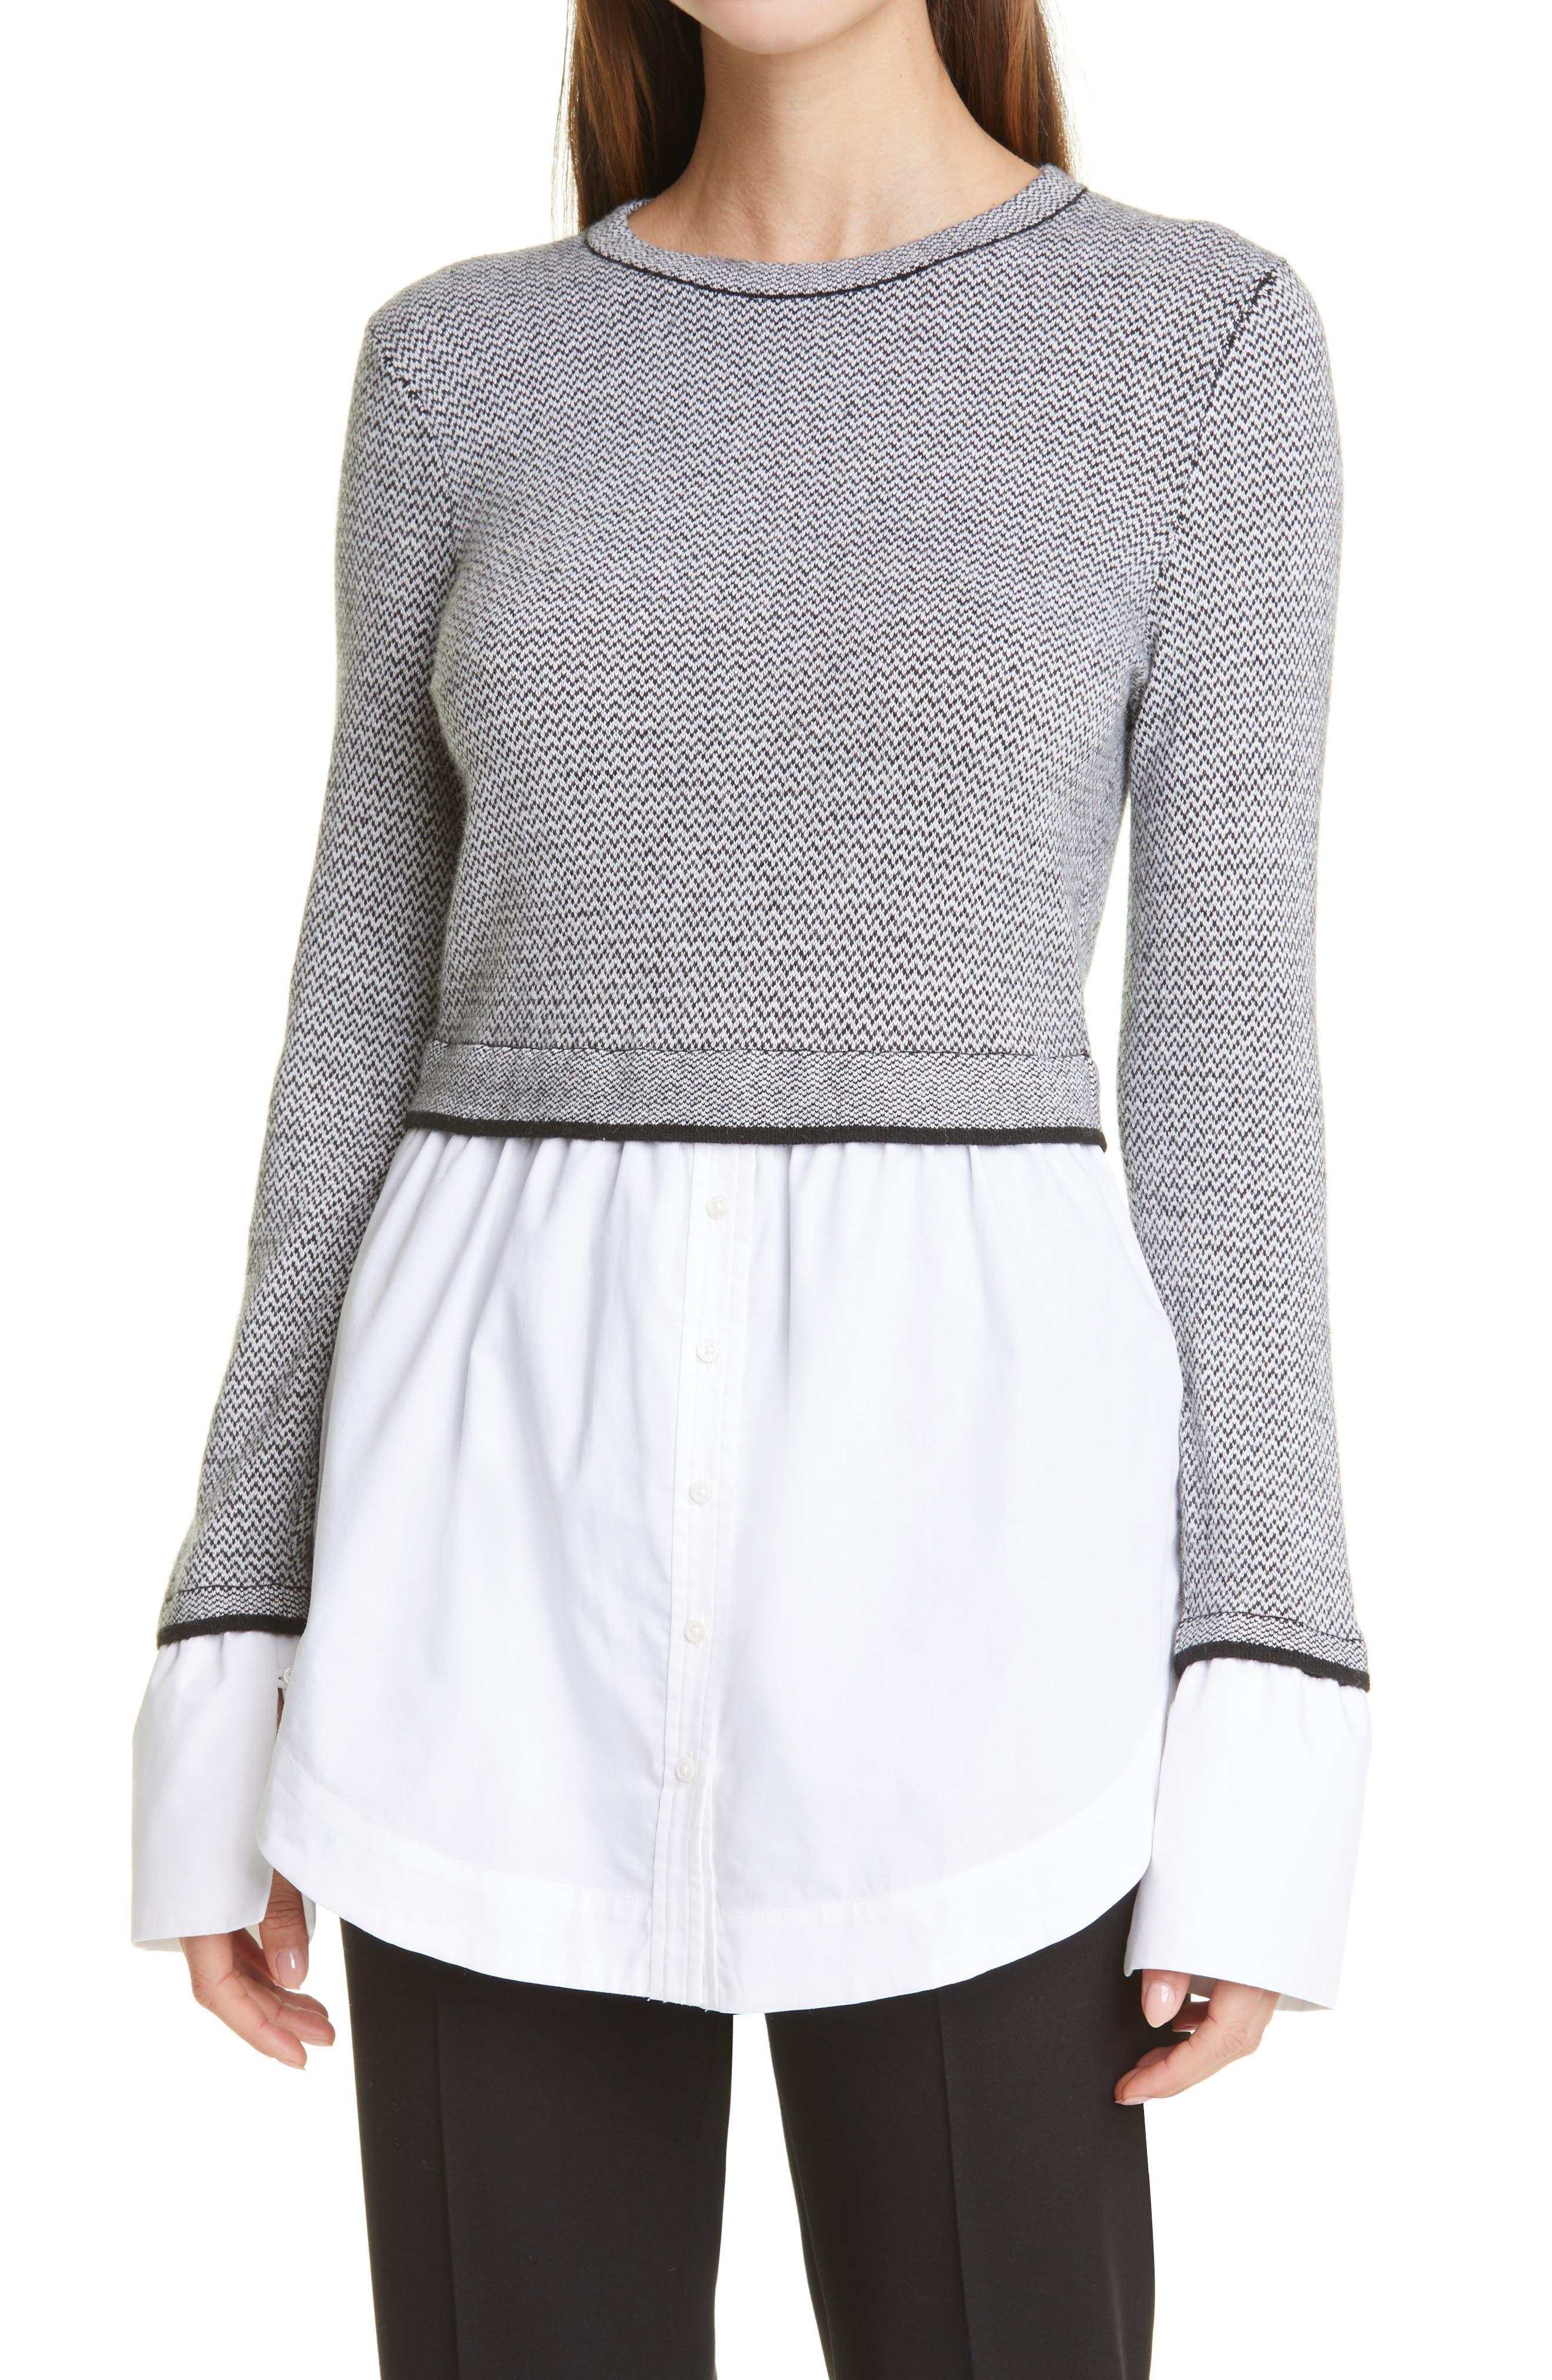 Club Monaco Berdine Layered Look Sweater with Button-Up Hem | Nordstrom